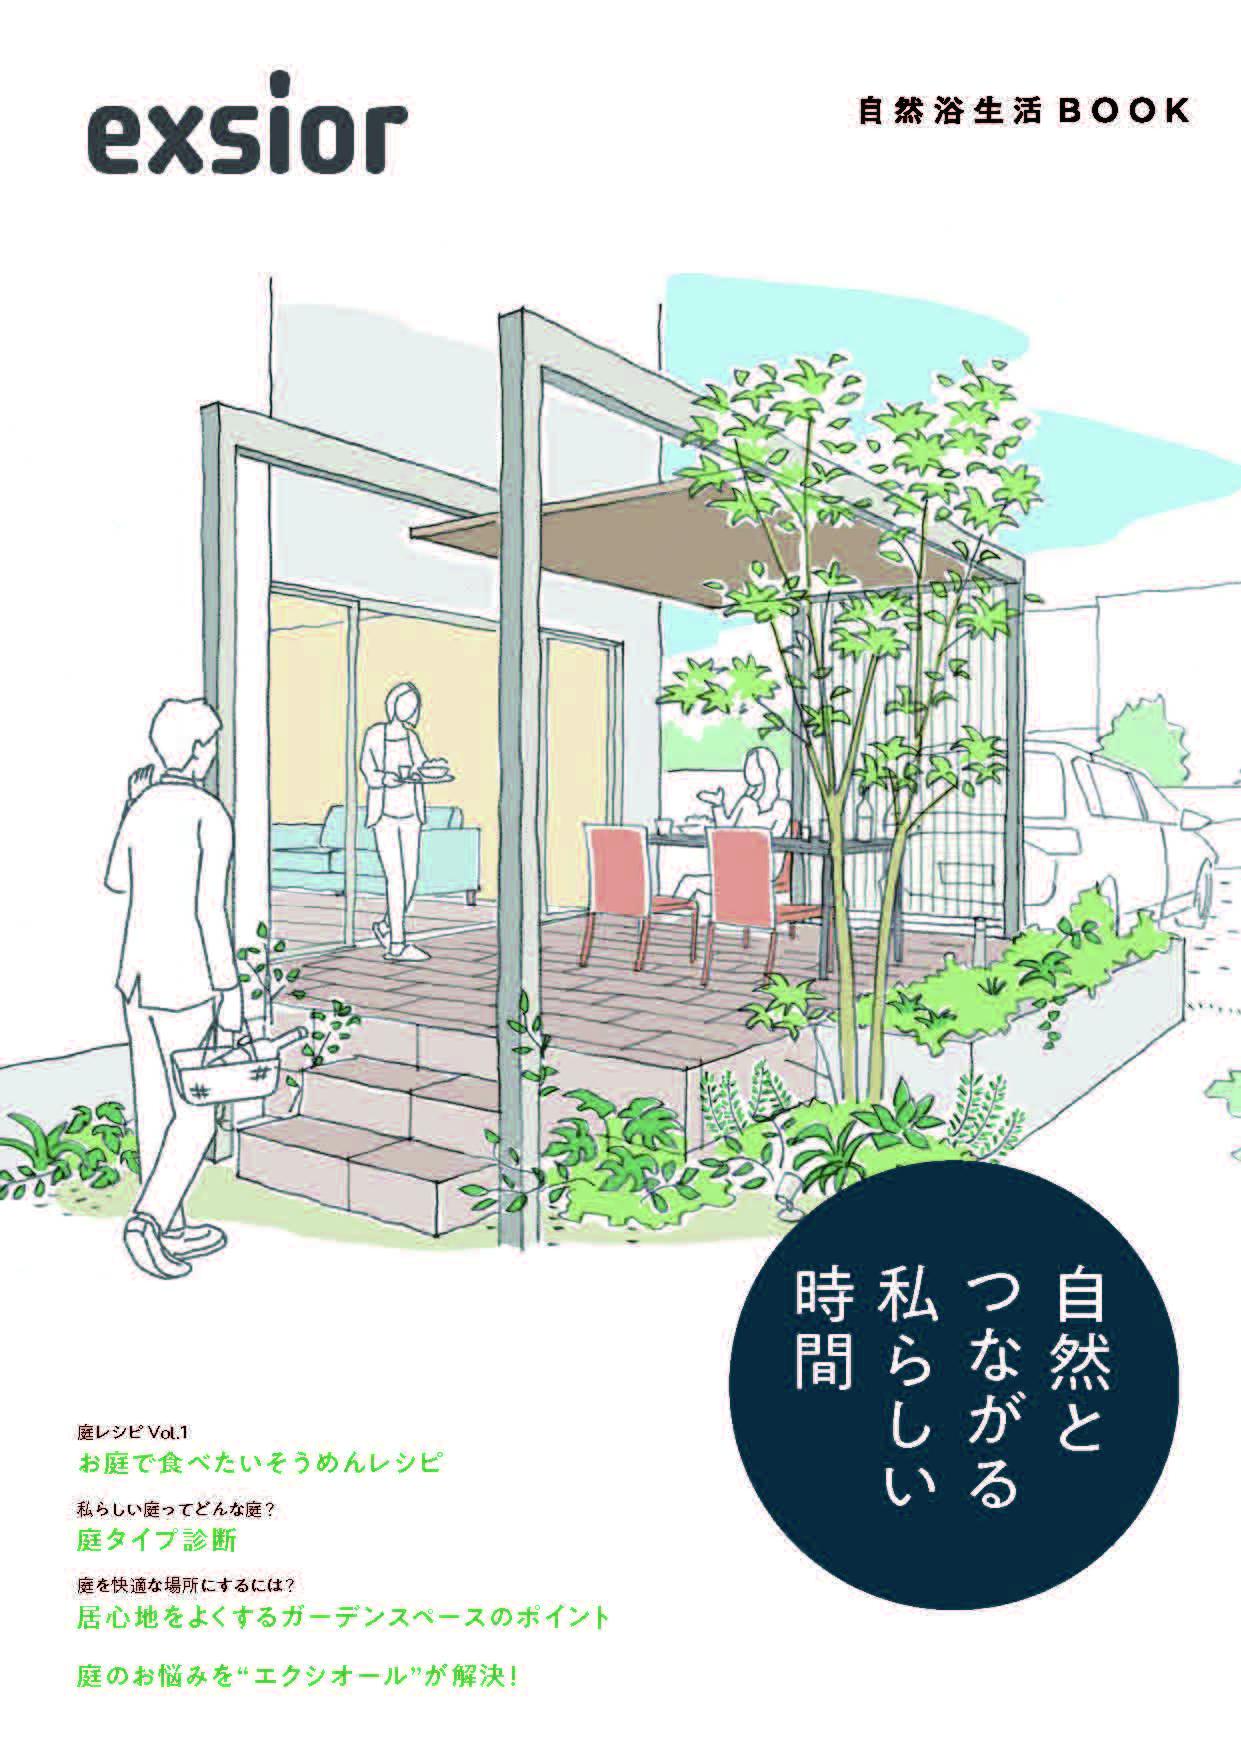 exsior magazine(Webマガジン)、 自然浴生活BOOK(冊子)